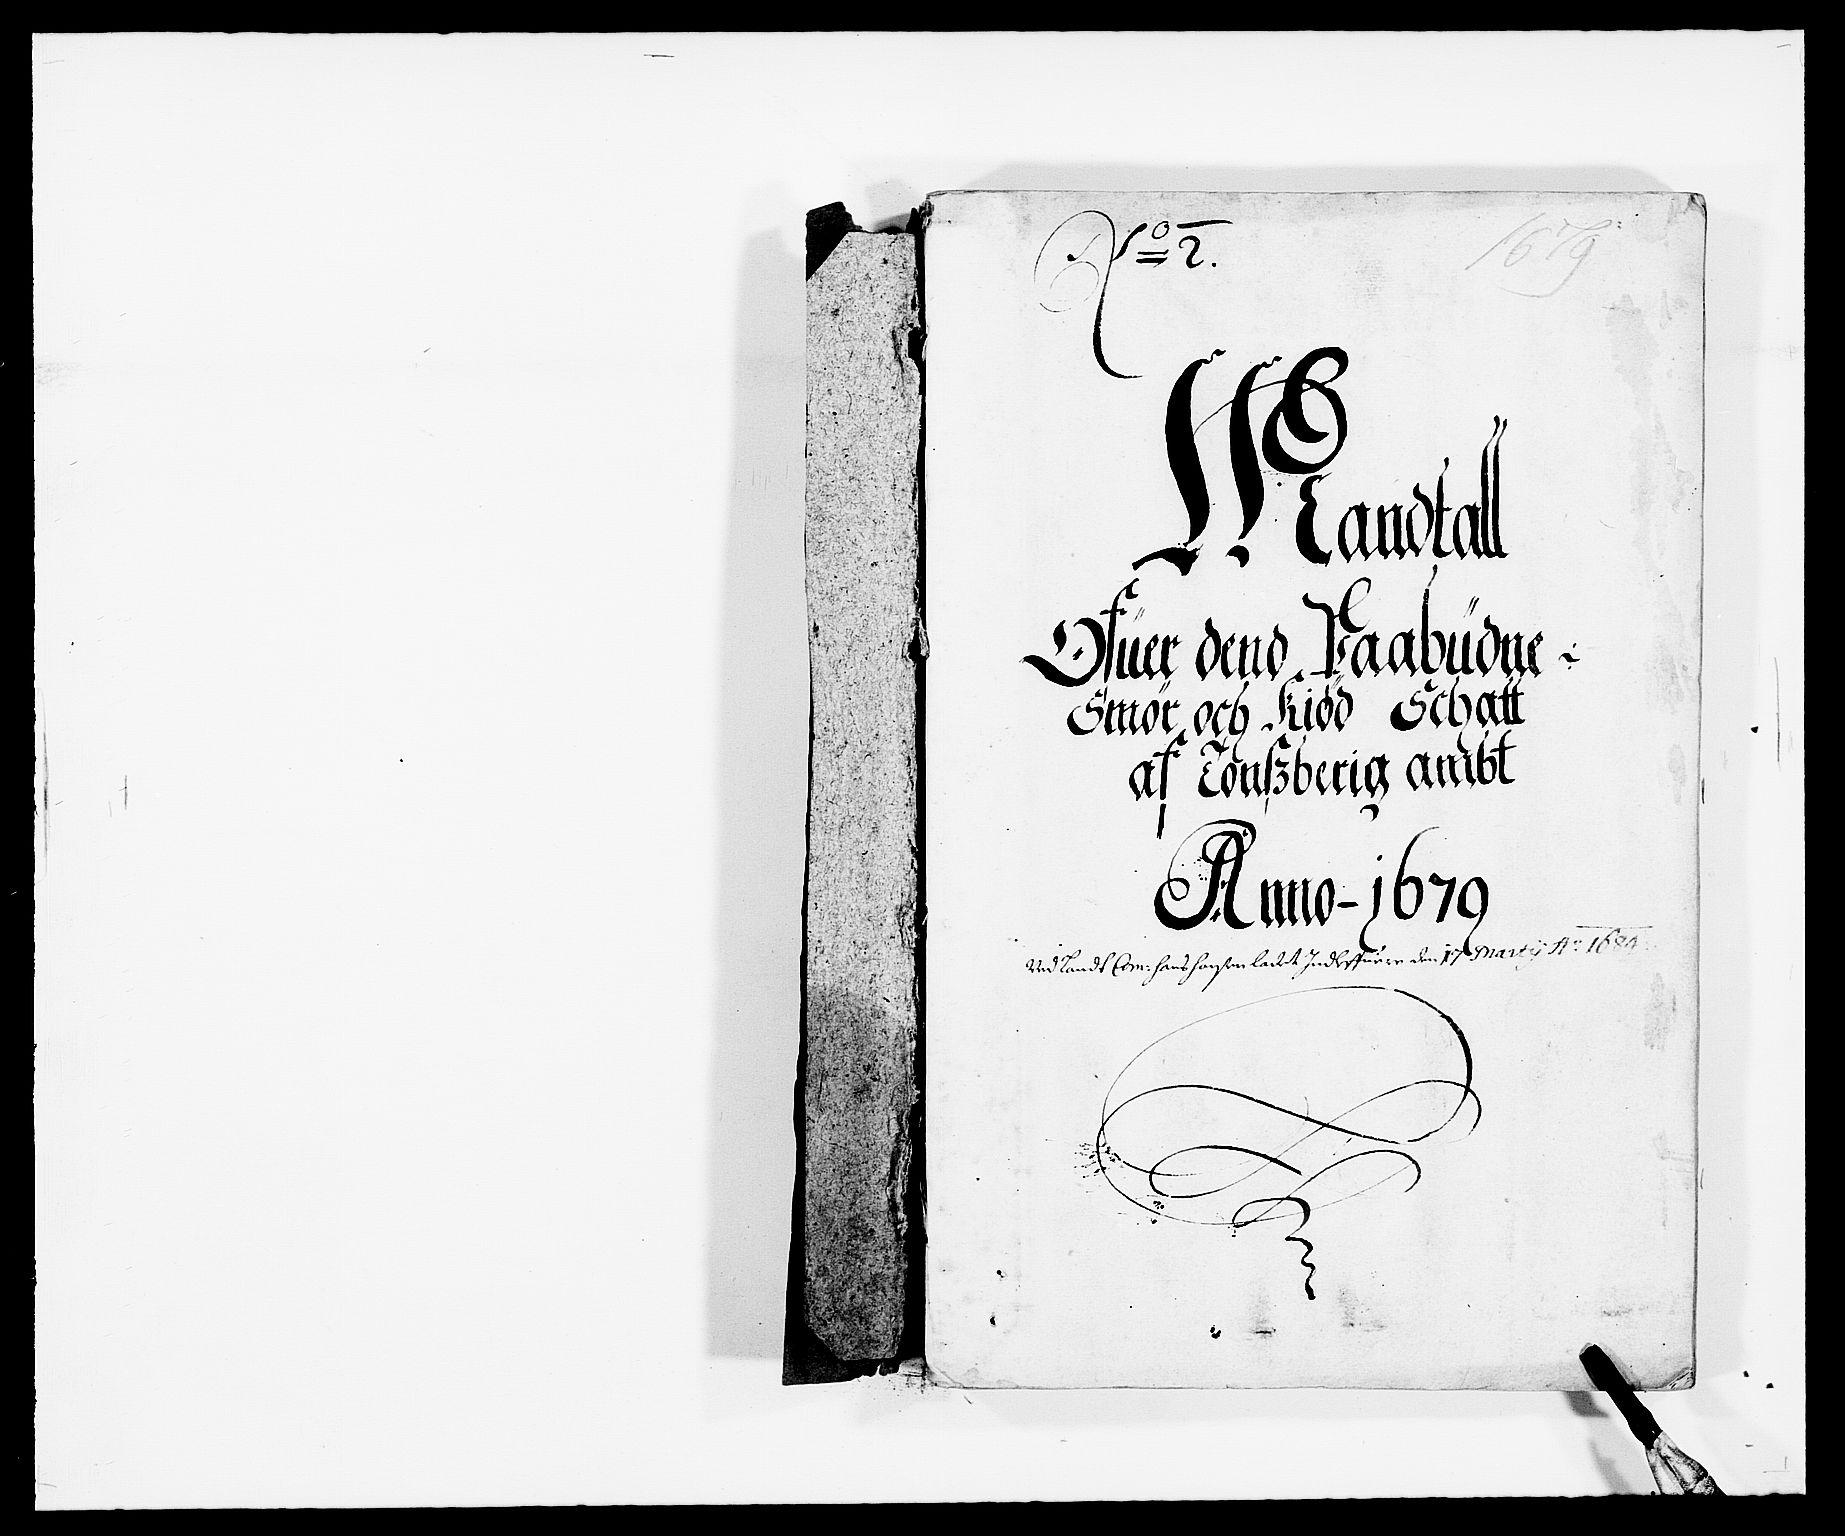 RA, Rentekammeret inntil 1814, Reviderte regnskaper, Fogderegnskap, R32/L1846: Fogderegnskap Jarlsberg grevskap, 1679-1680, s. 140